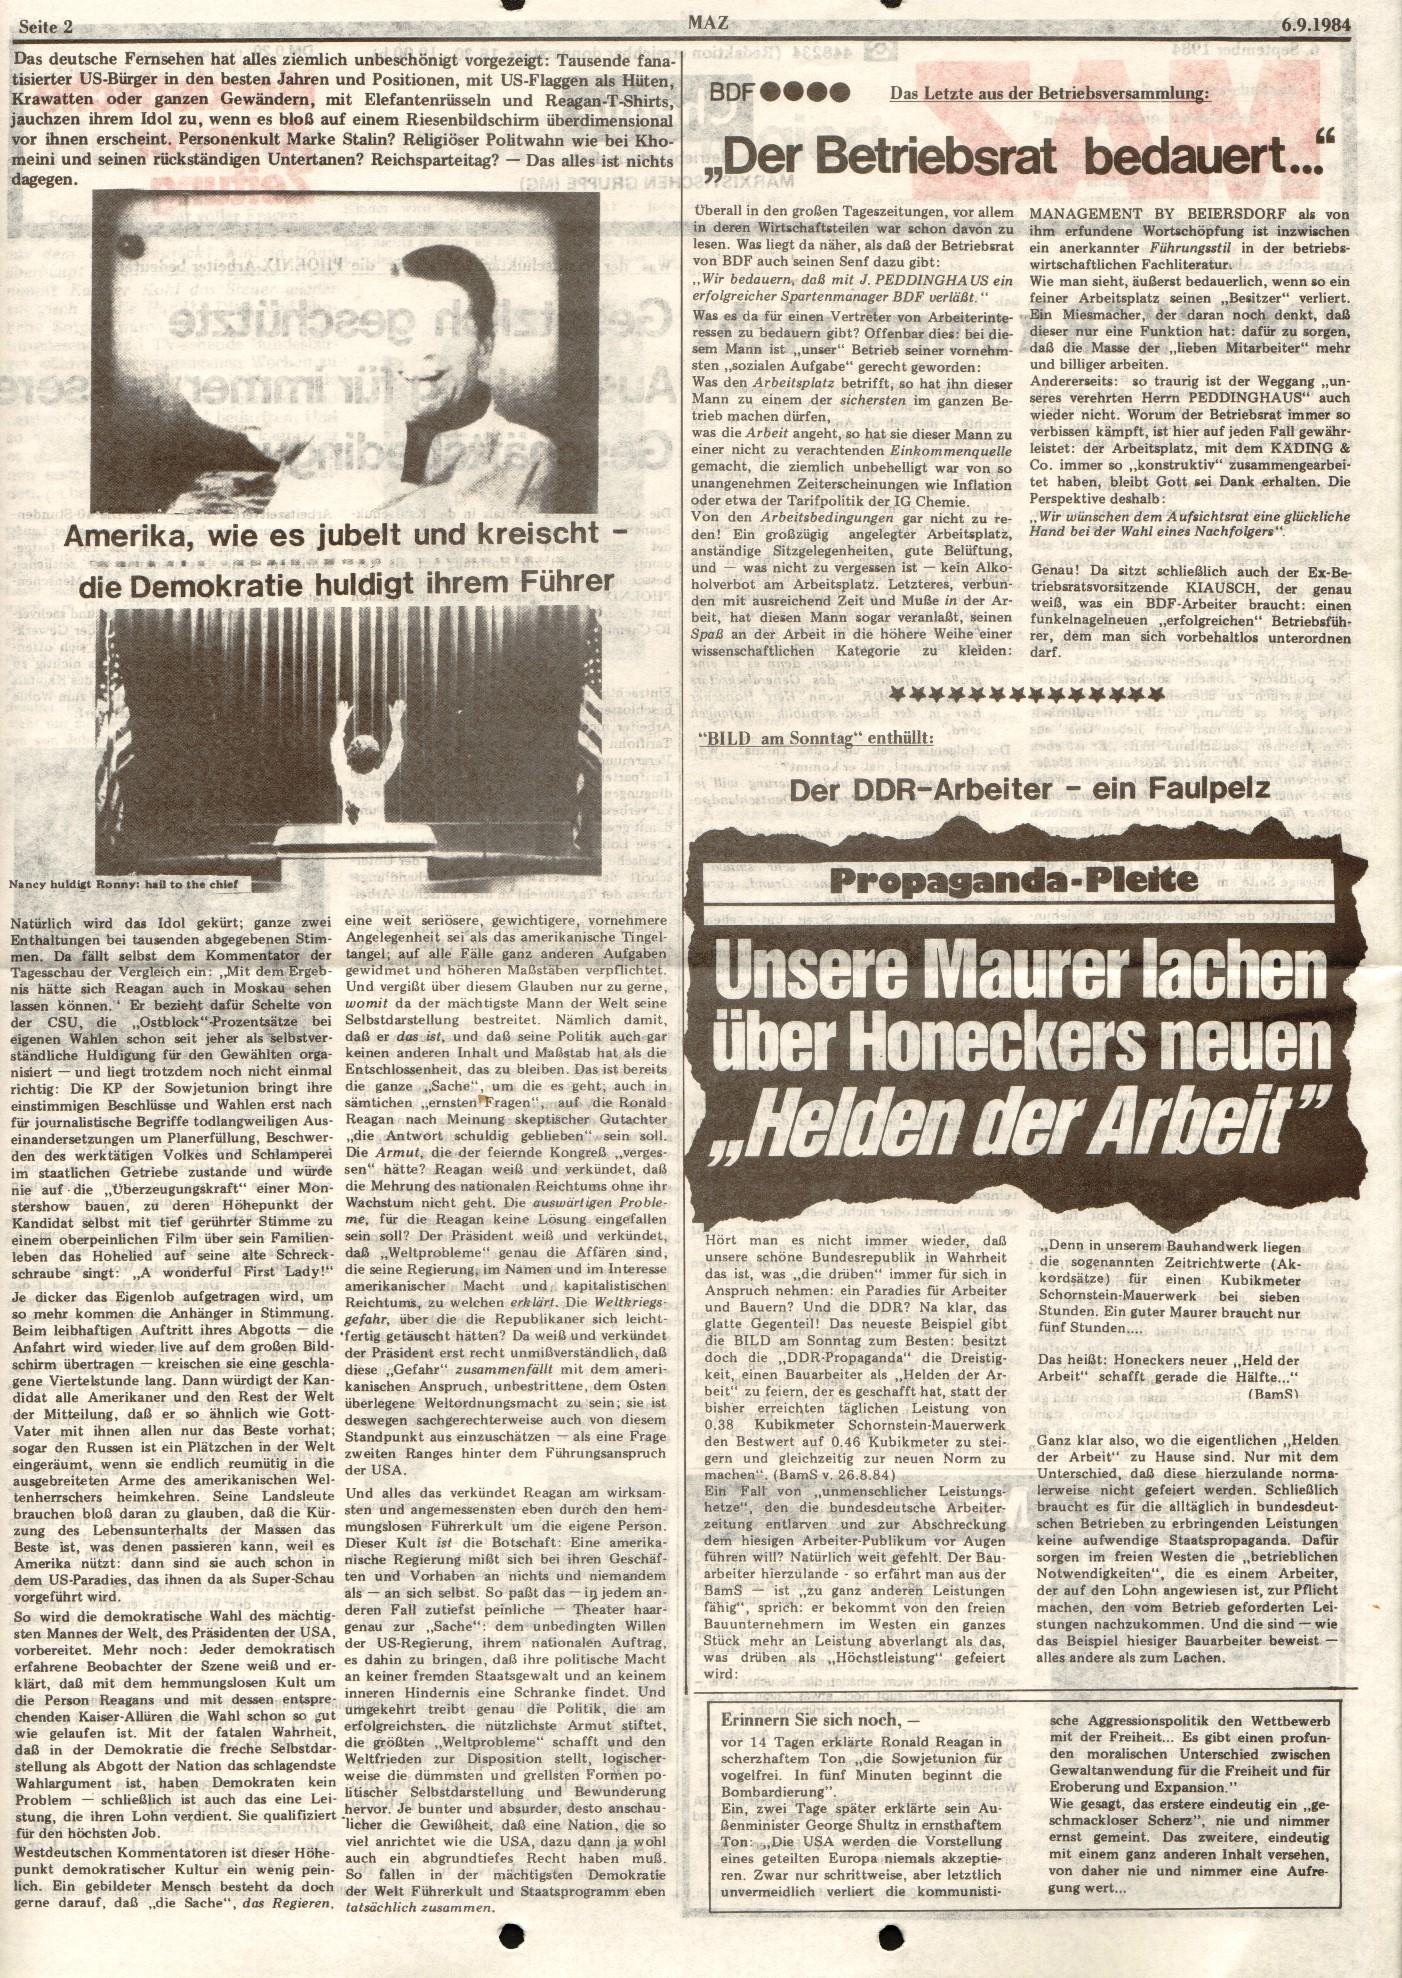 Hamburg_MG_MAZ_Chemie_19840906_02